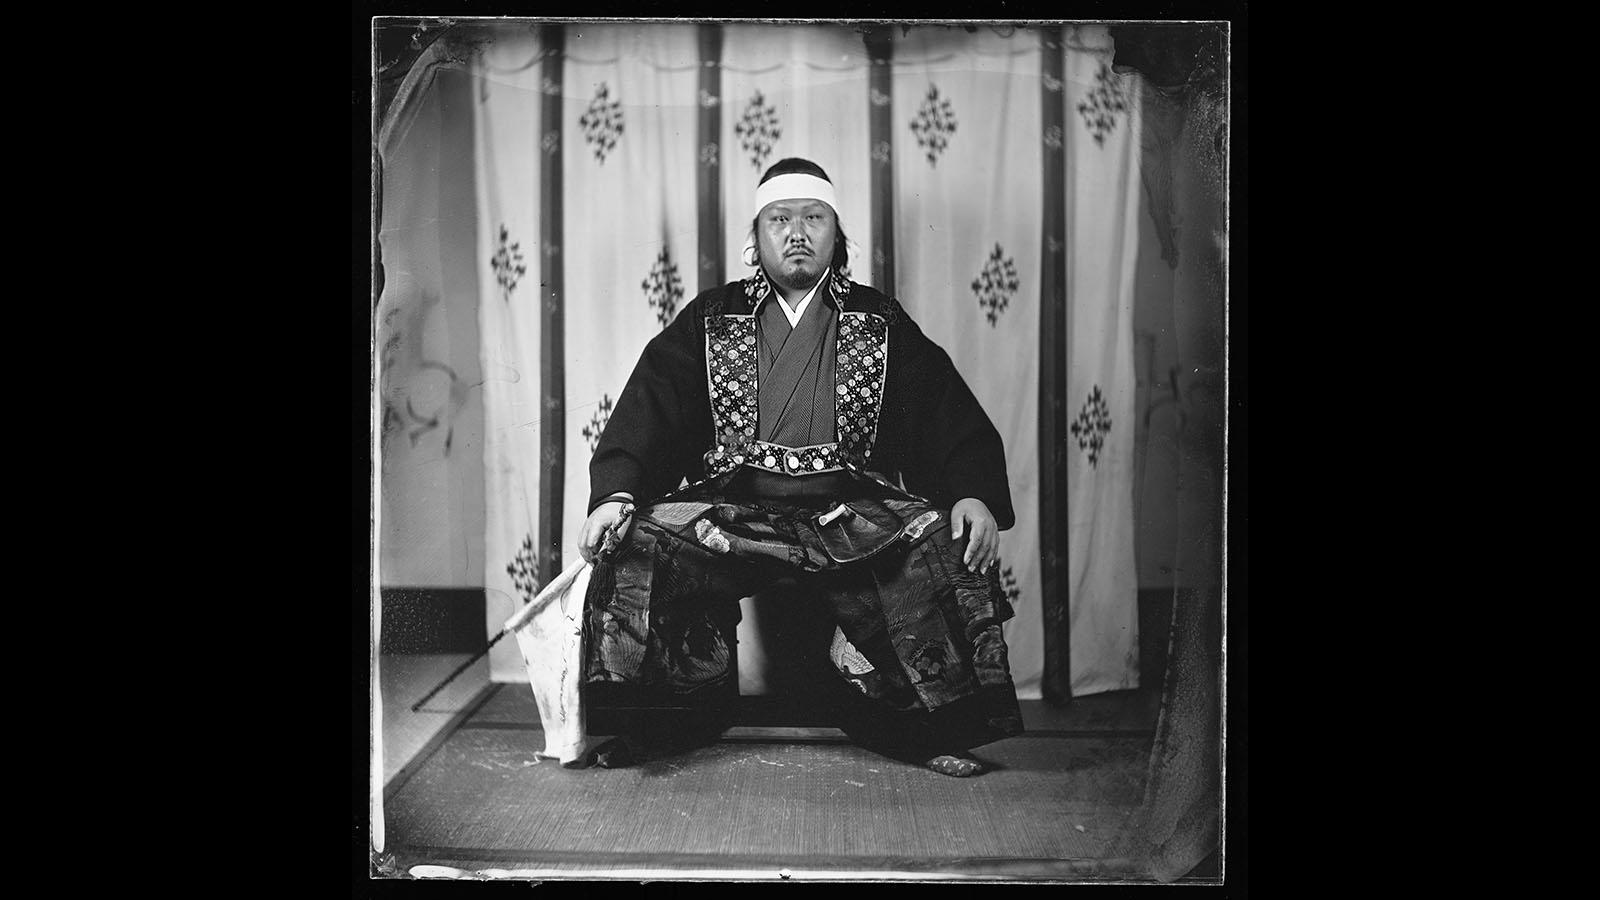 Photographer captures descendents of Japanese samurai - CNN Style